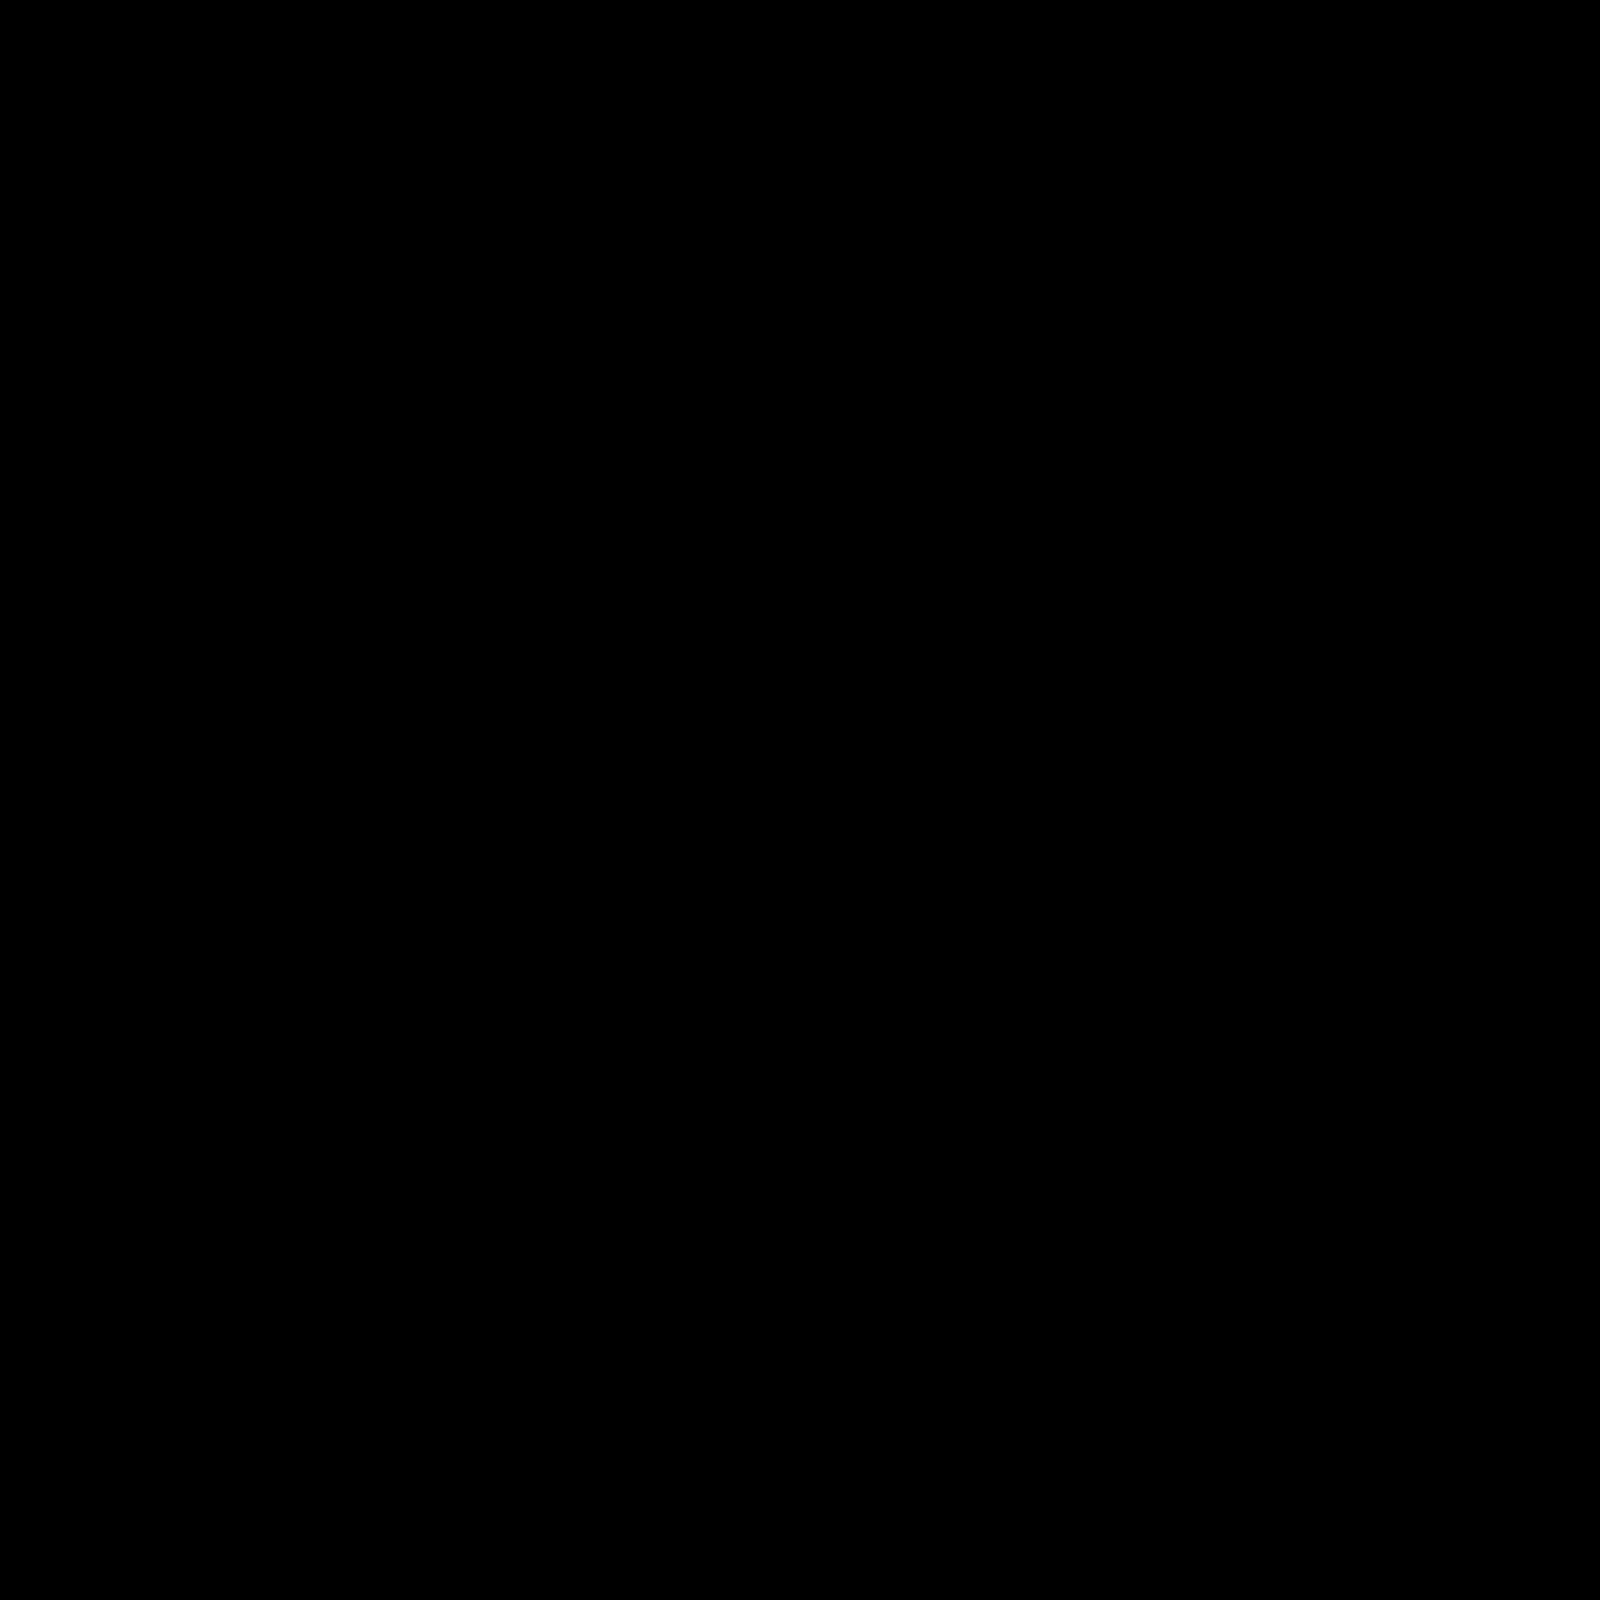 Pixar Lamp 2 icon